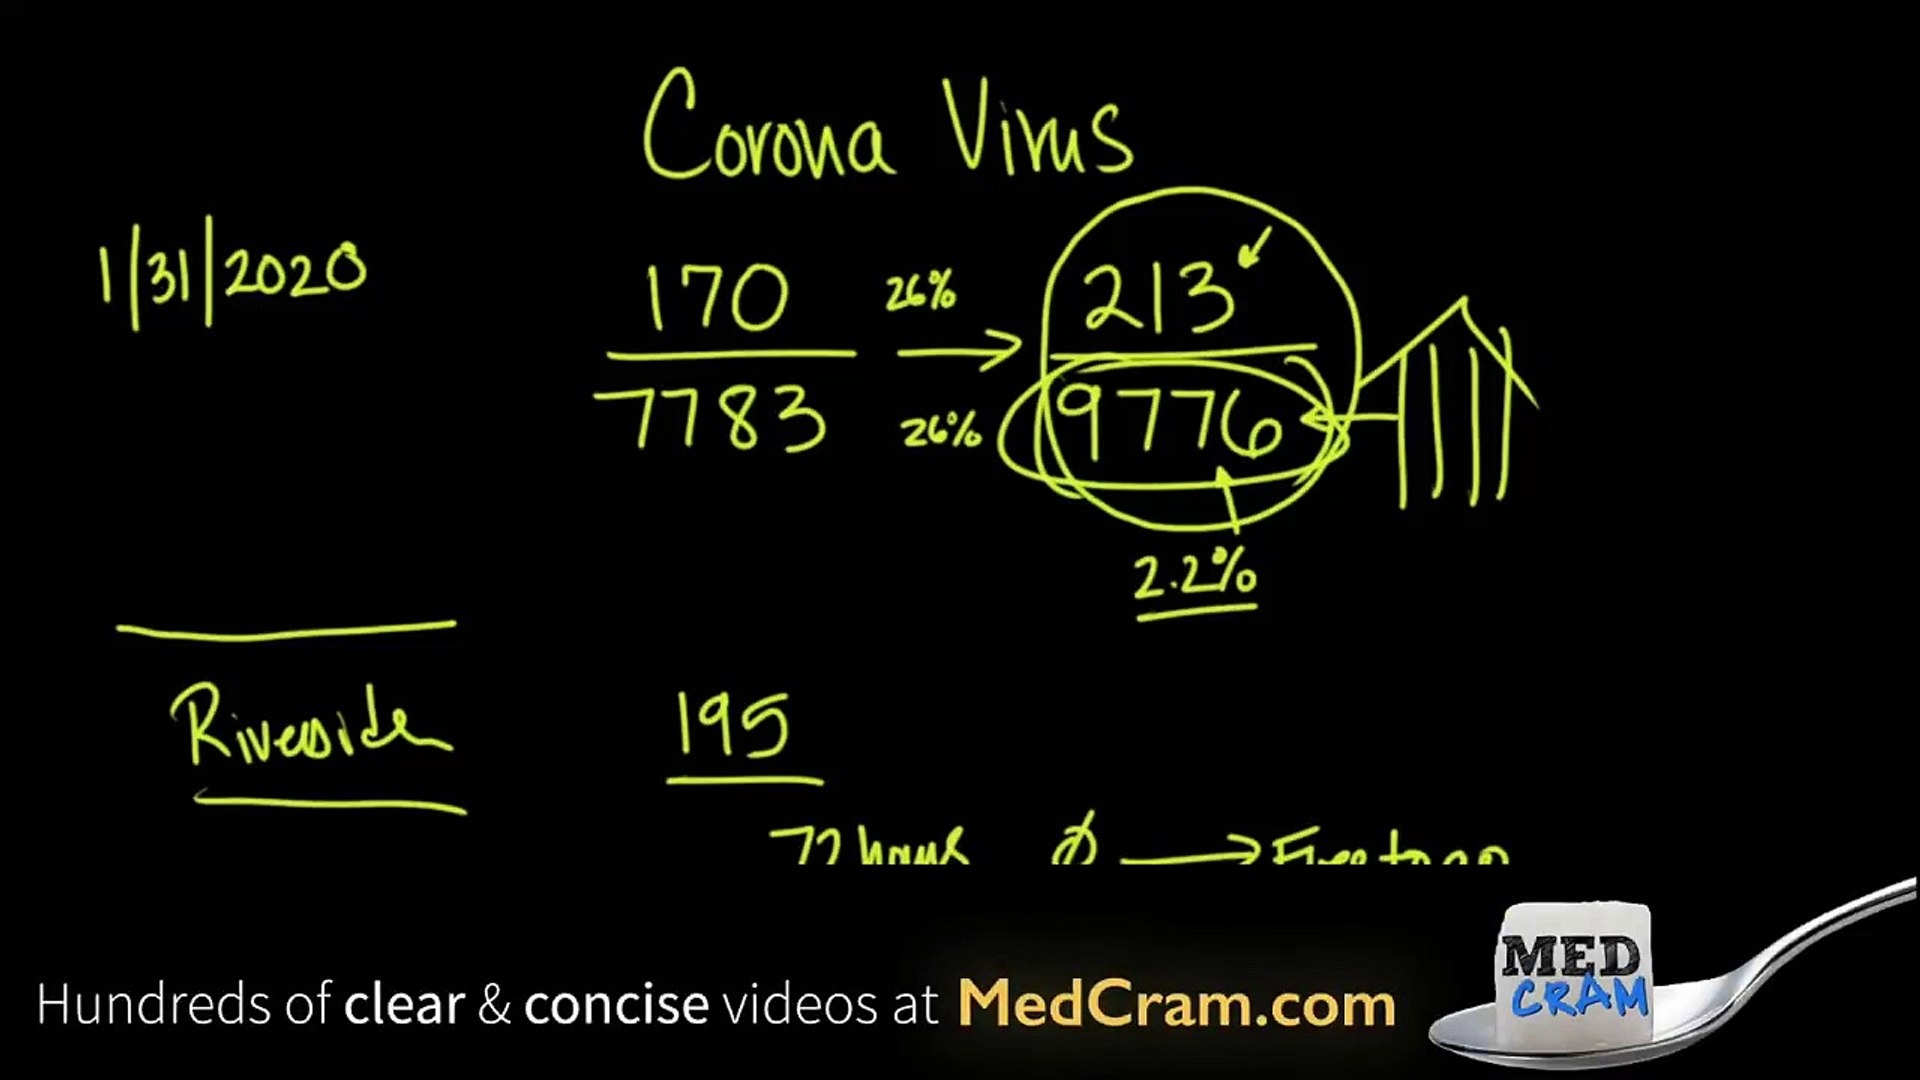 Coronavirus Epidemic Update 7: Global Health Emergency Declared, Viral Shedding